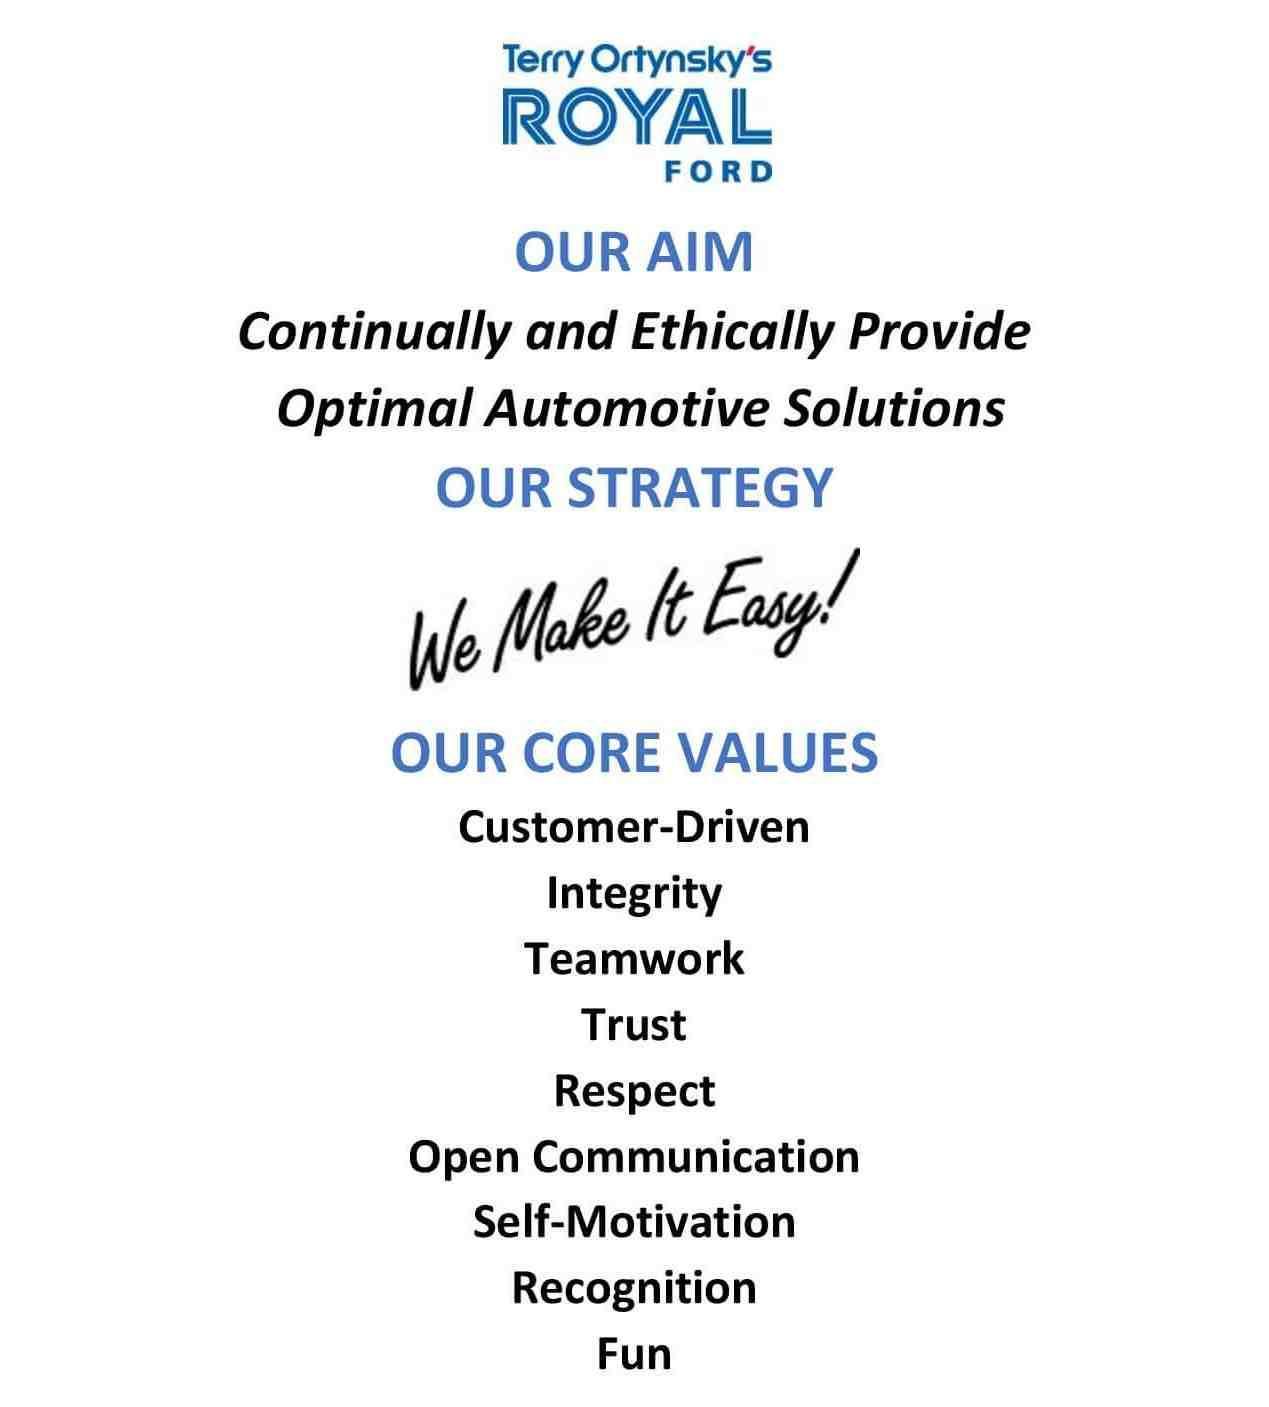 Royal Ford Values